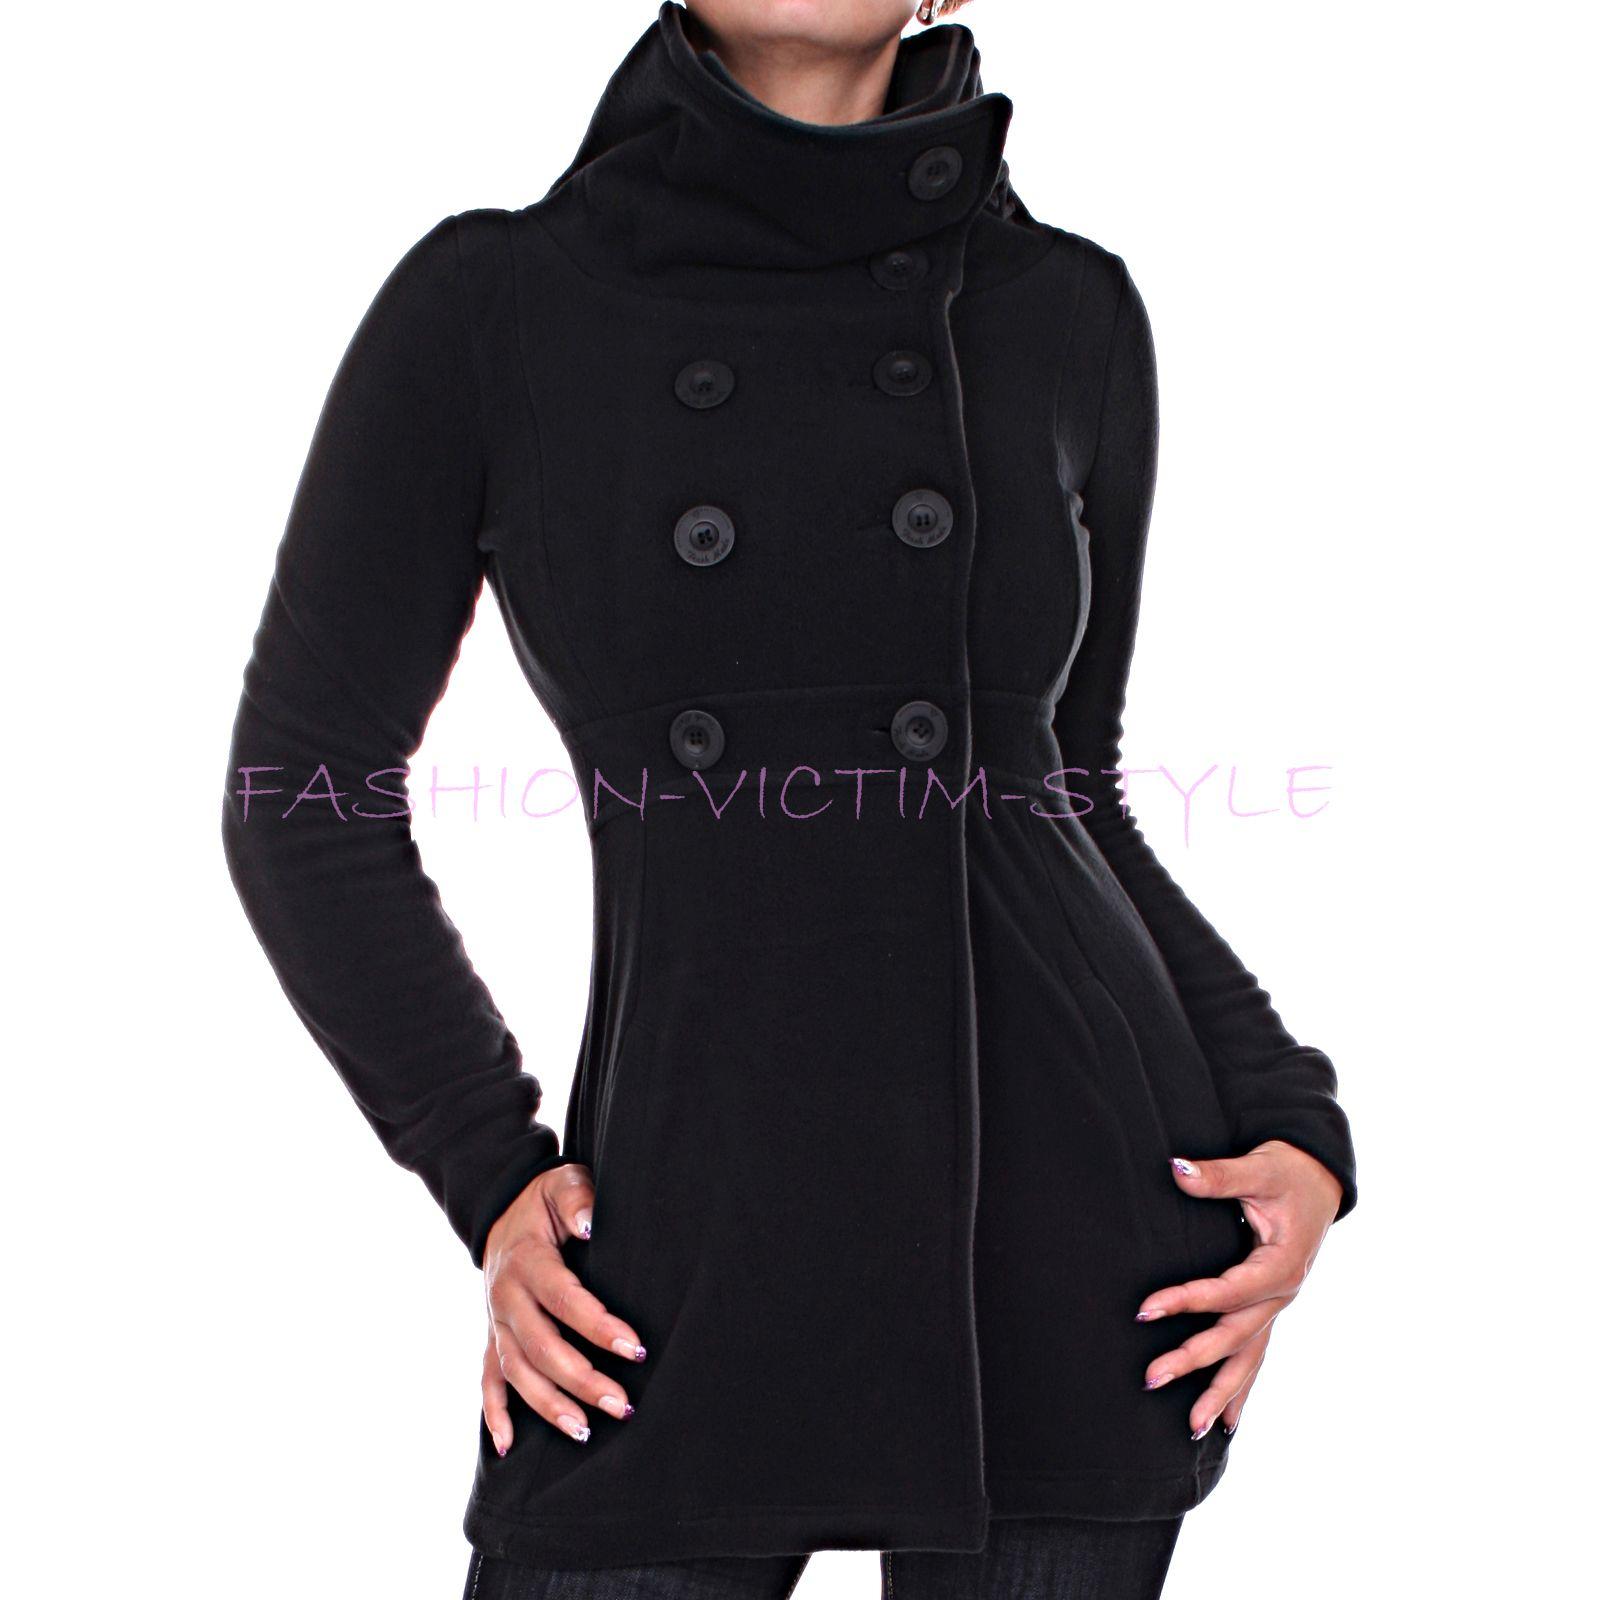 damen fleece mantel fleece jacke kurz mantel a line ebay. Black Bedroom Furniture Sets. Home Design Ideas